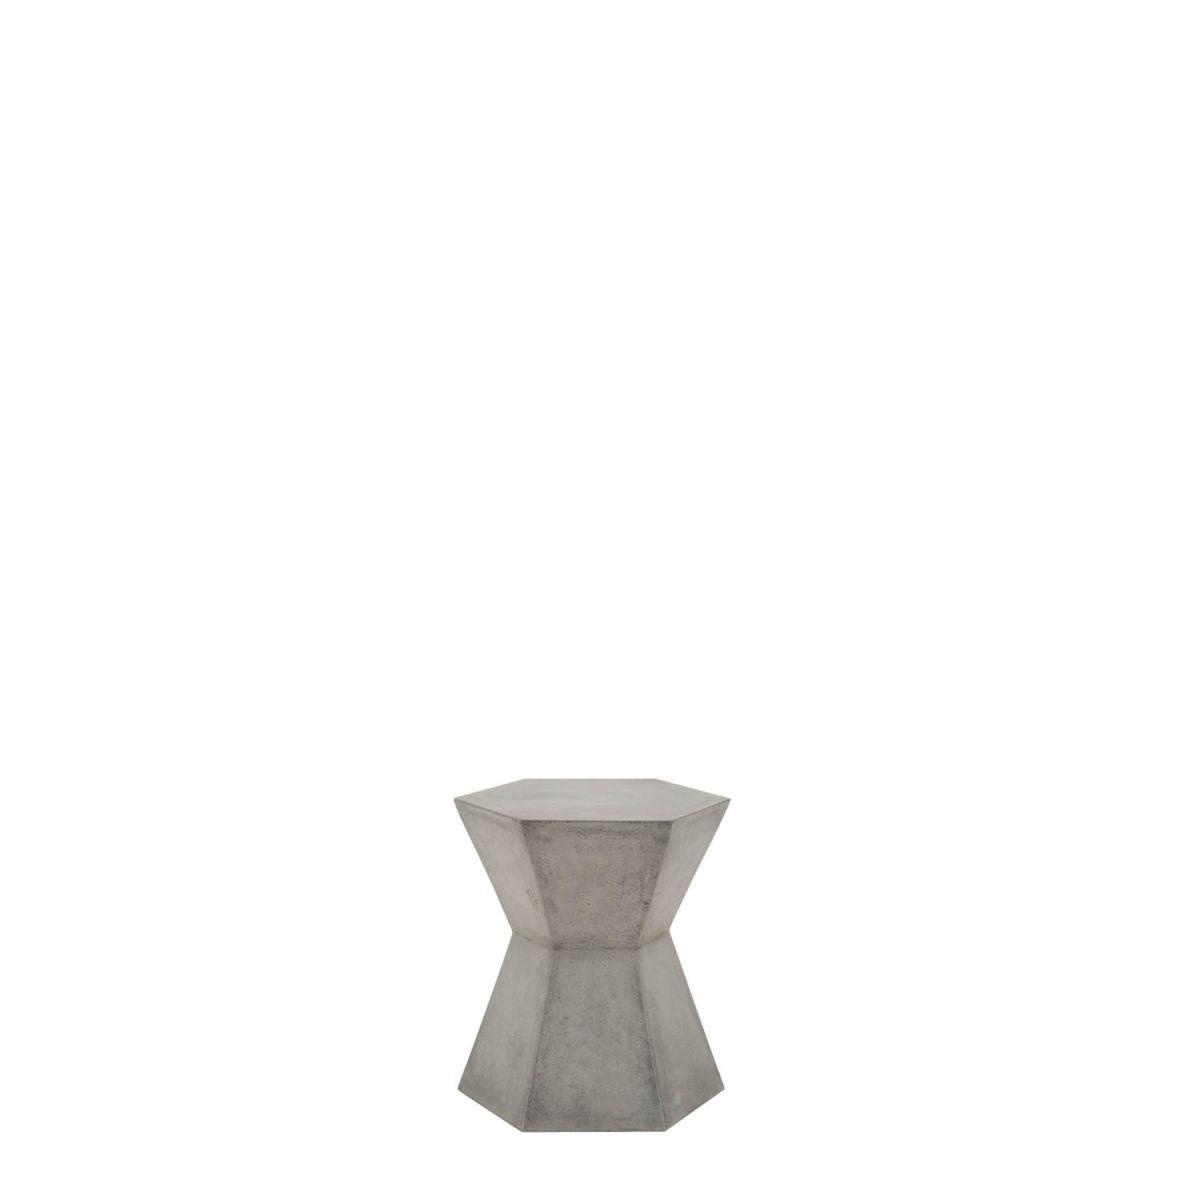 Terrific Bento Accent Table Ibusinesslaw Wood Chair Design Ideas Ibusinesslaworg